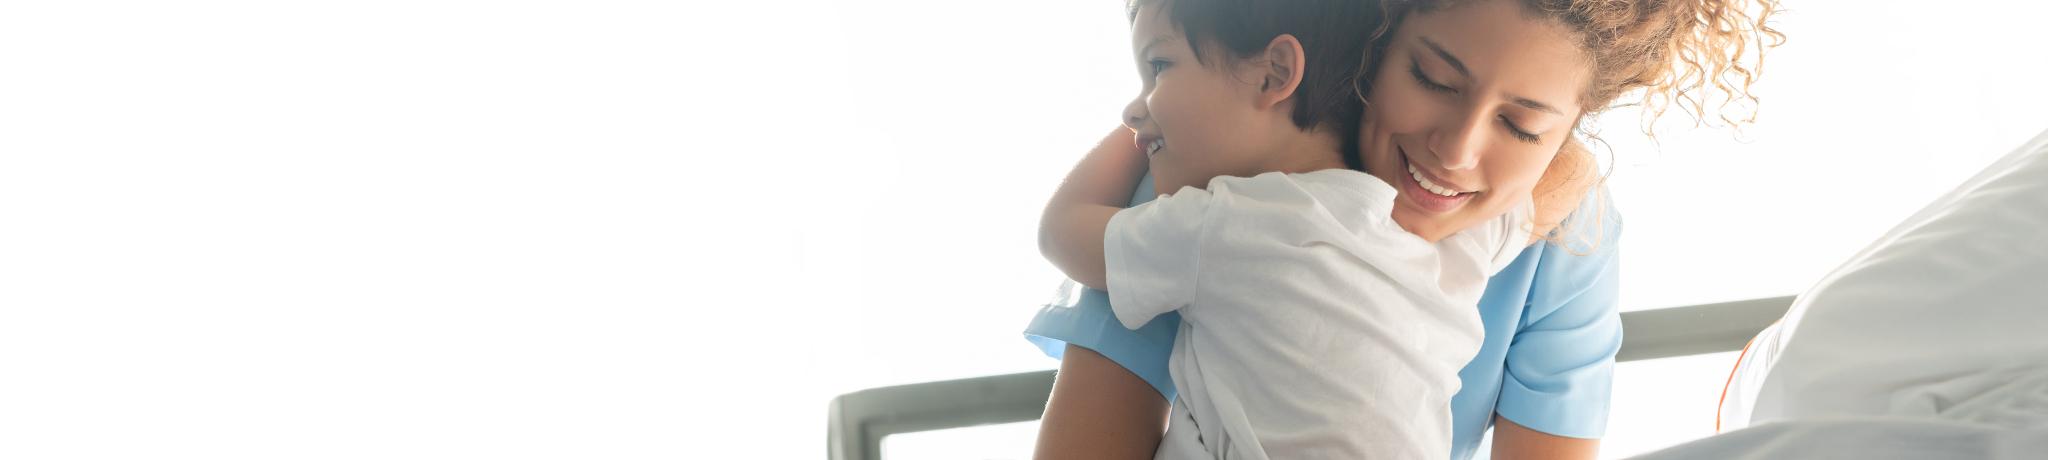 Pediatric Hospitalists